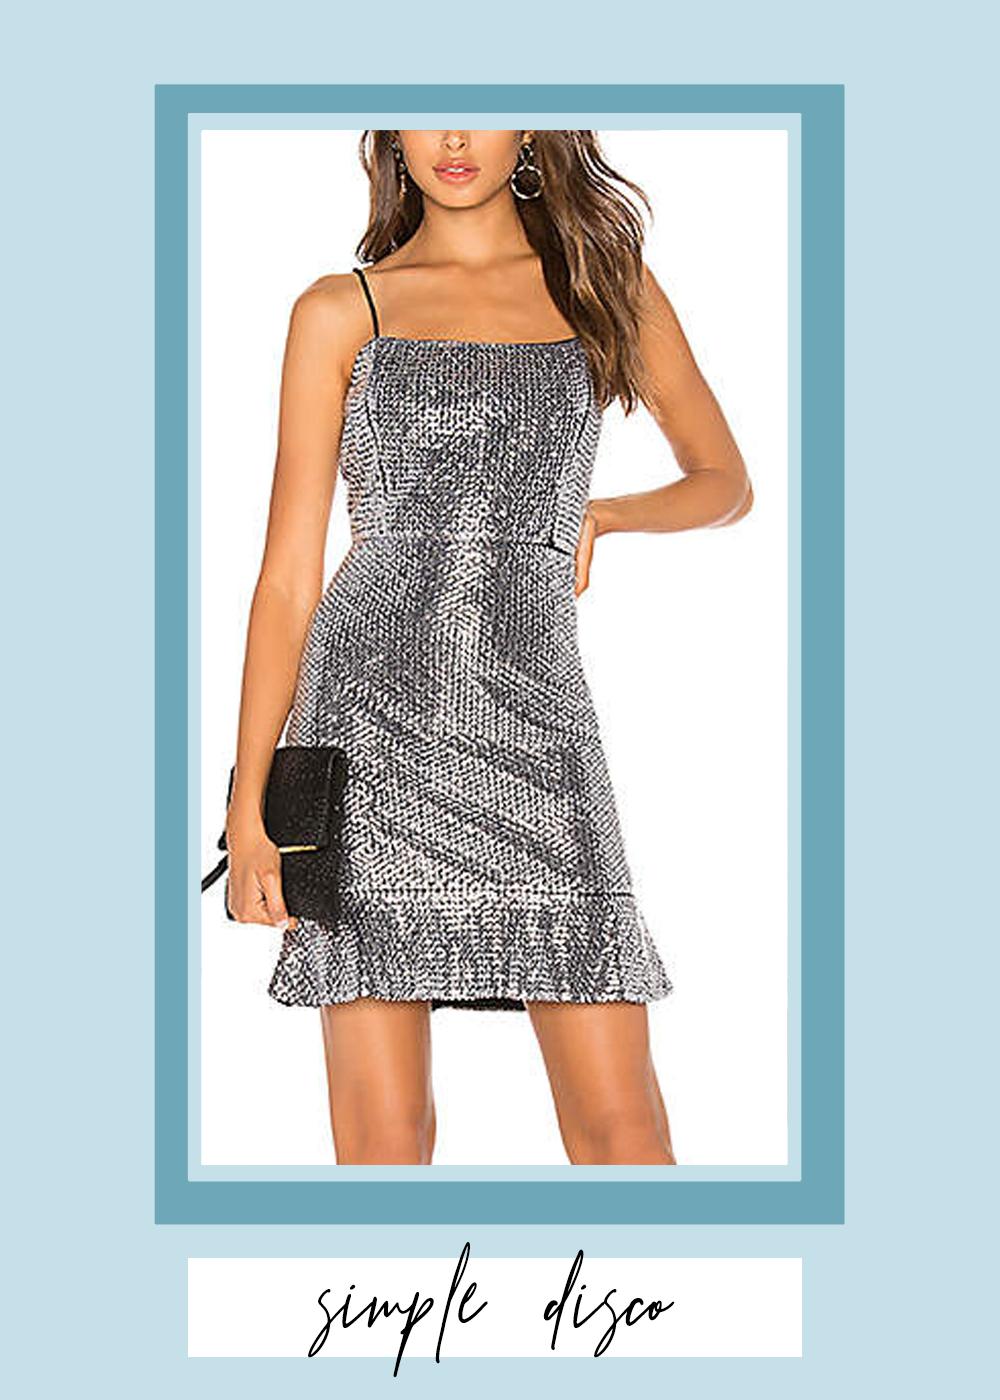 001. - Sequin Mini Dress // $89